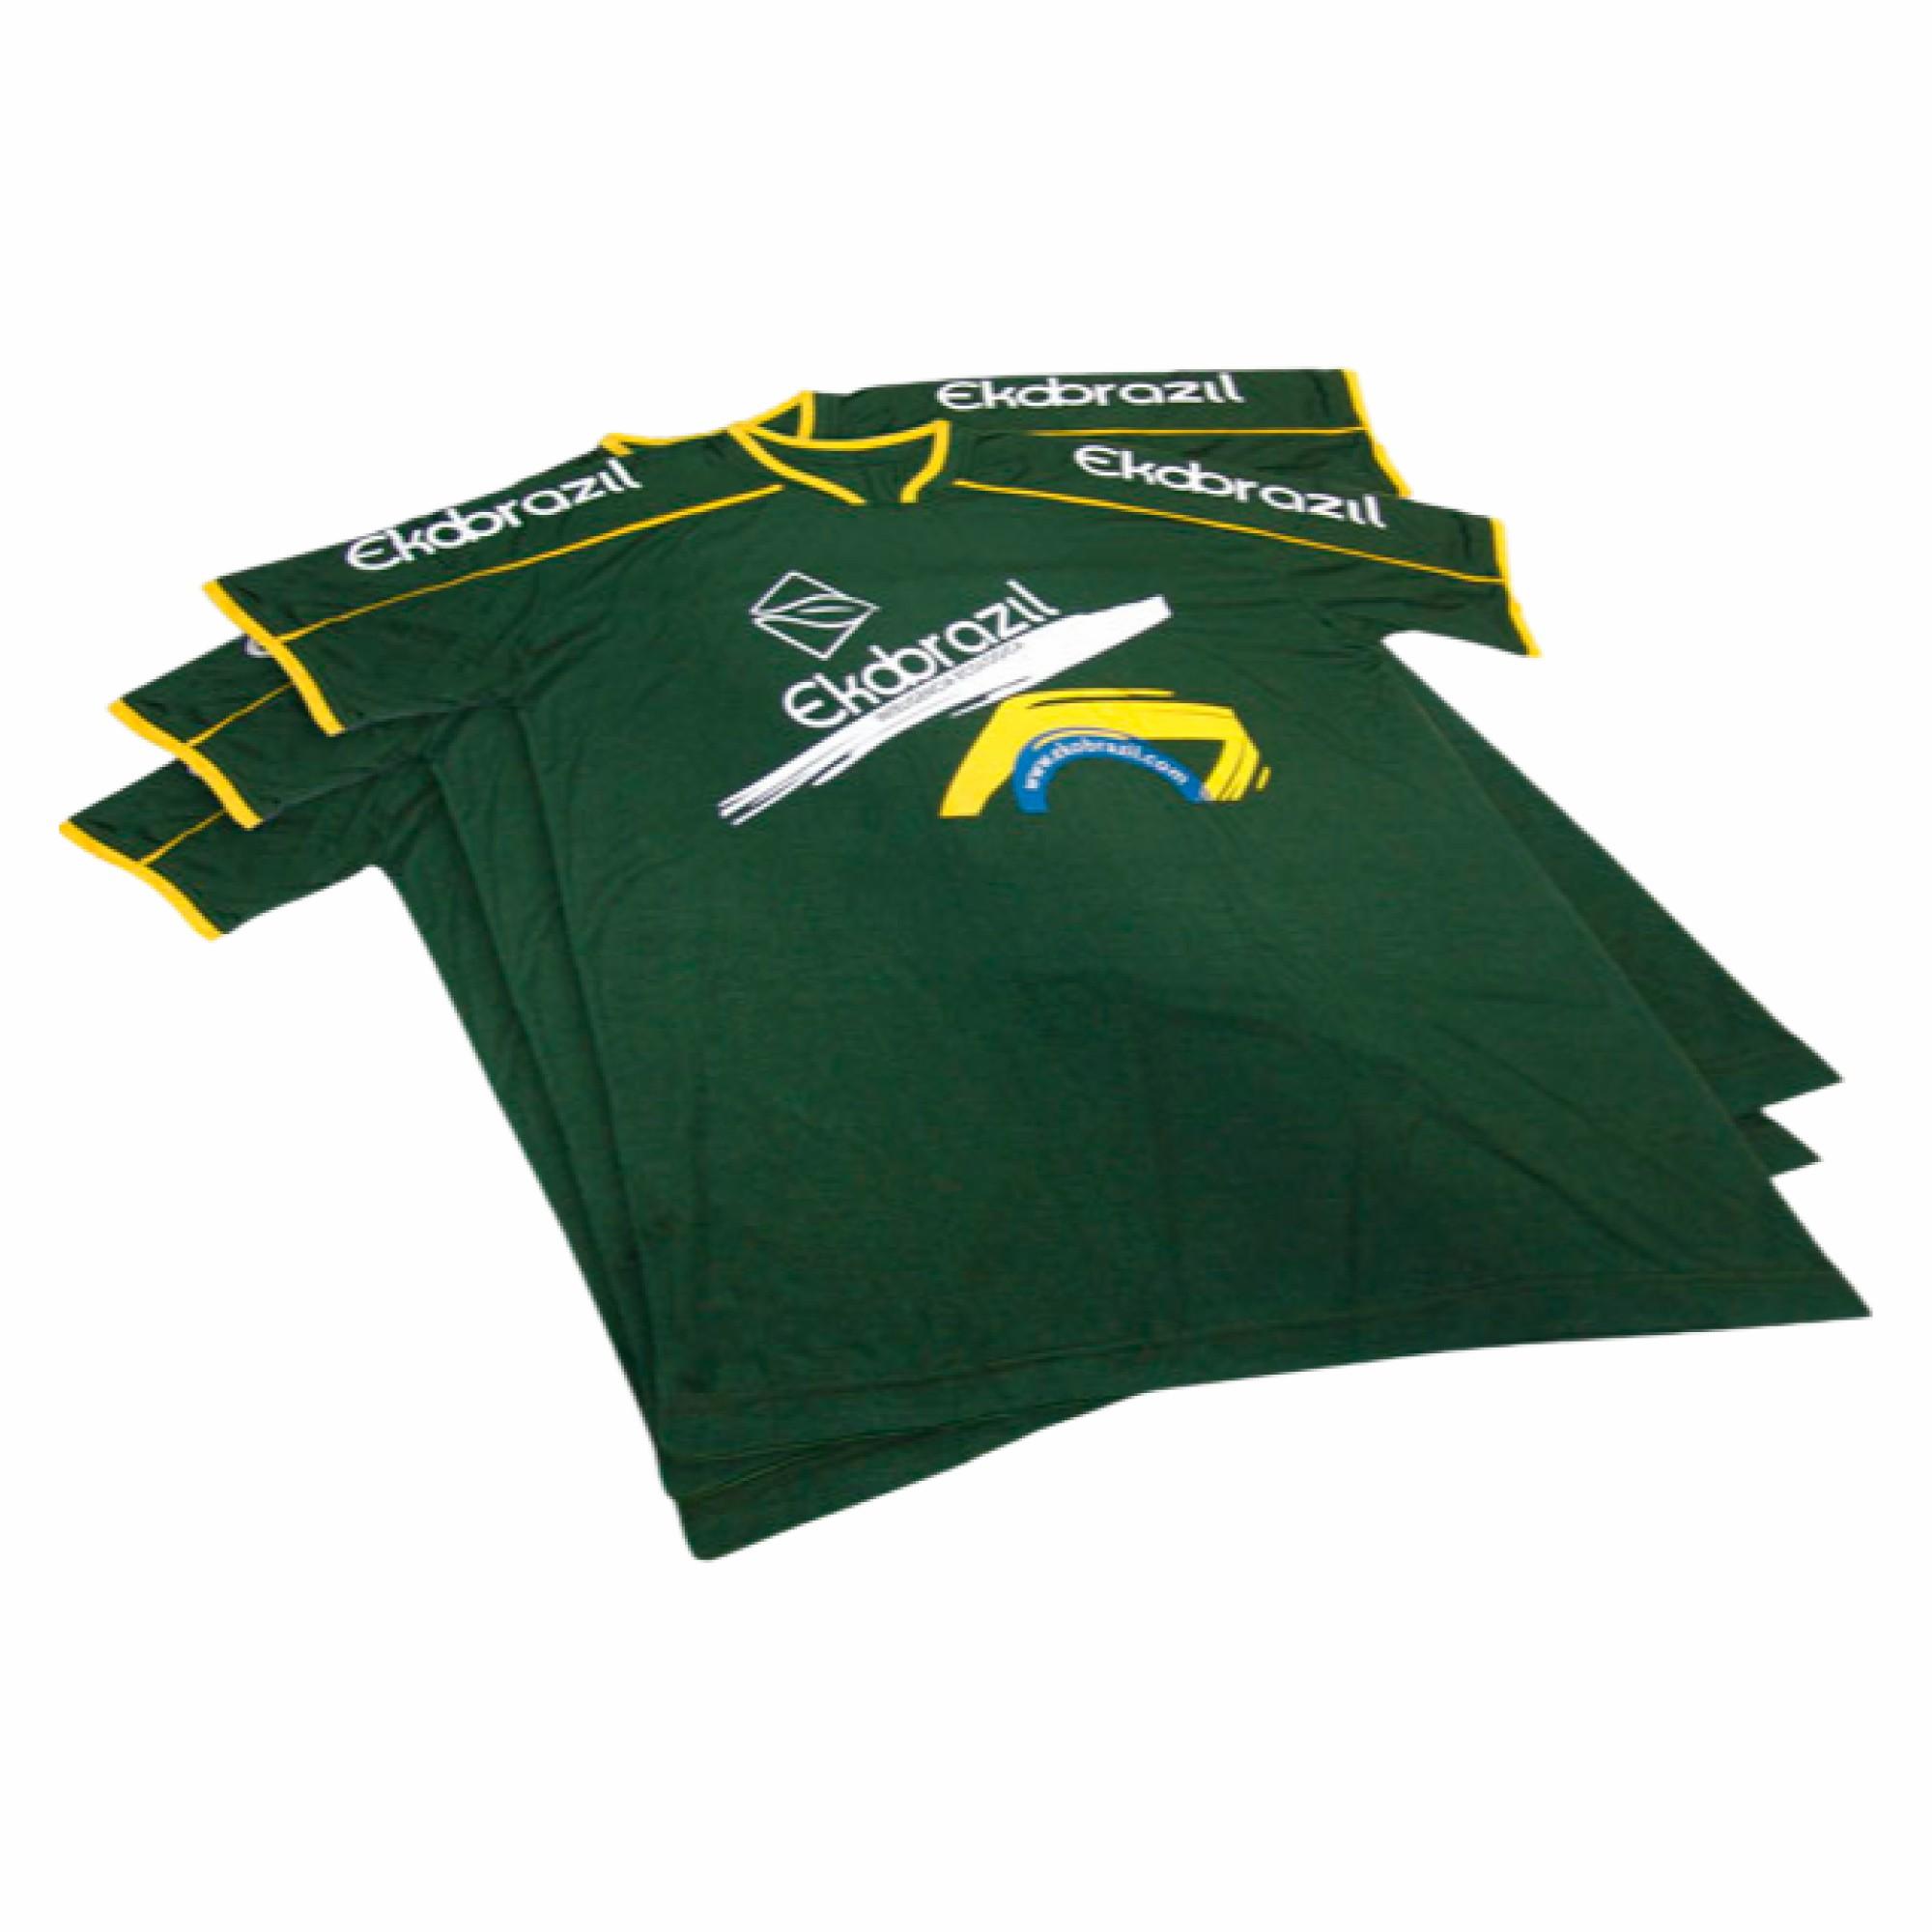 Preço Camiseta Ekobrazil M